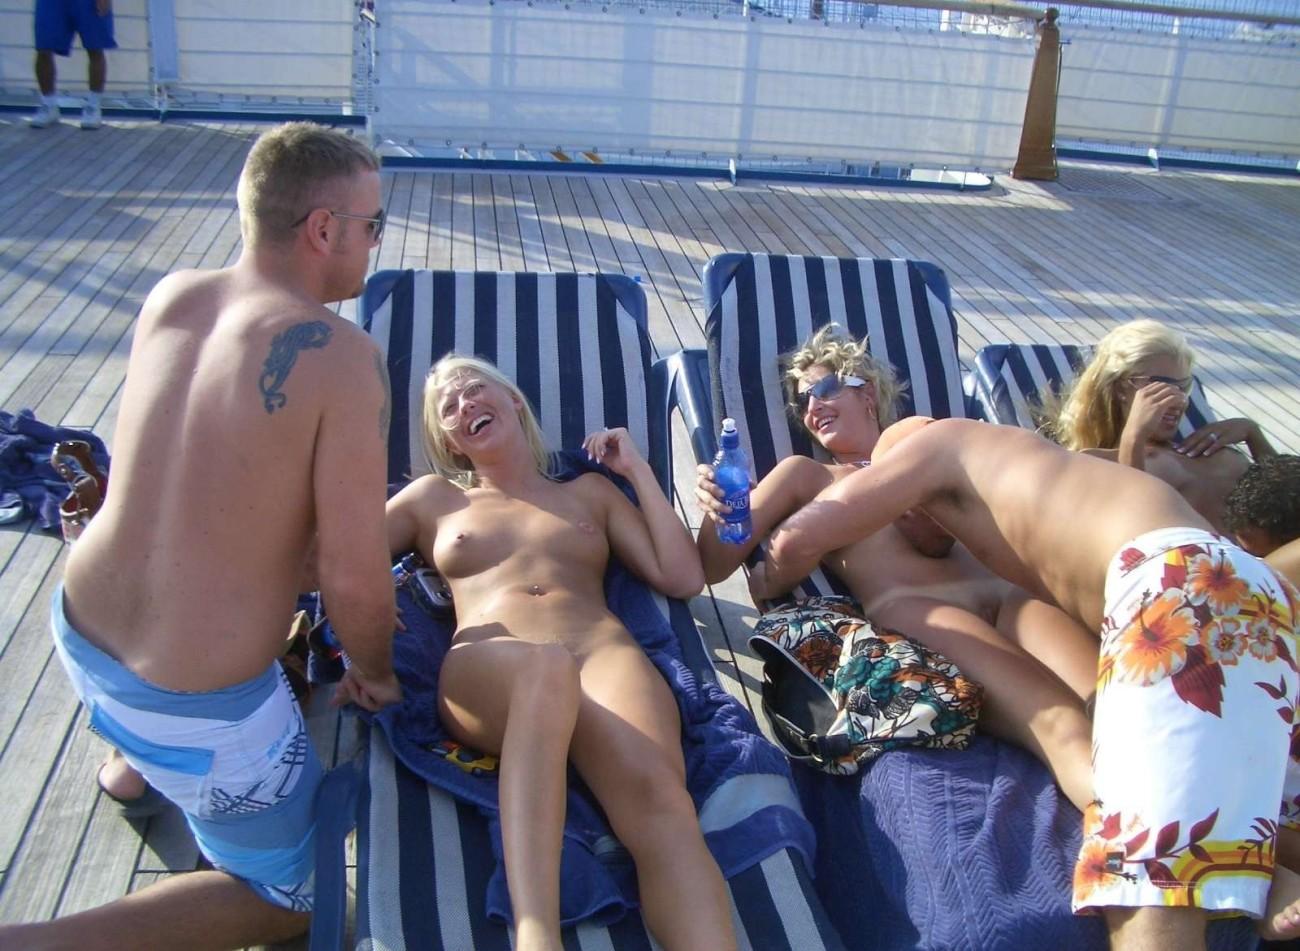 Gay cruiseship with pornstars -..